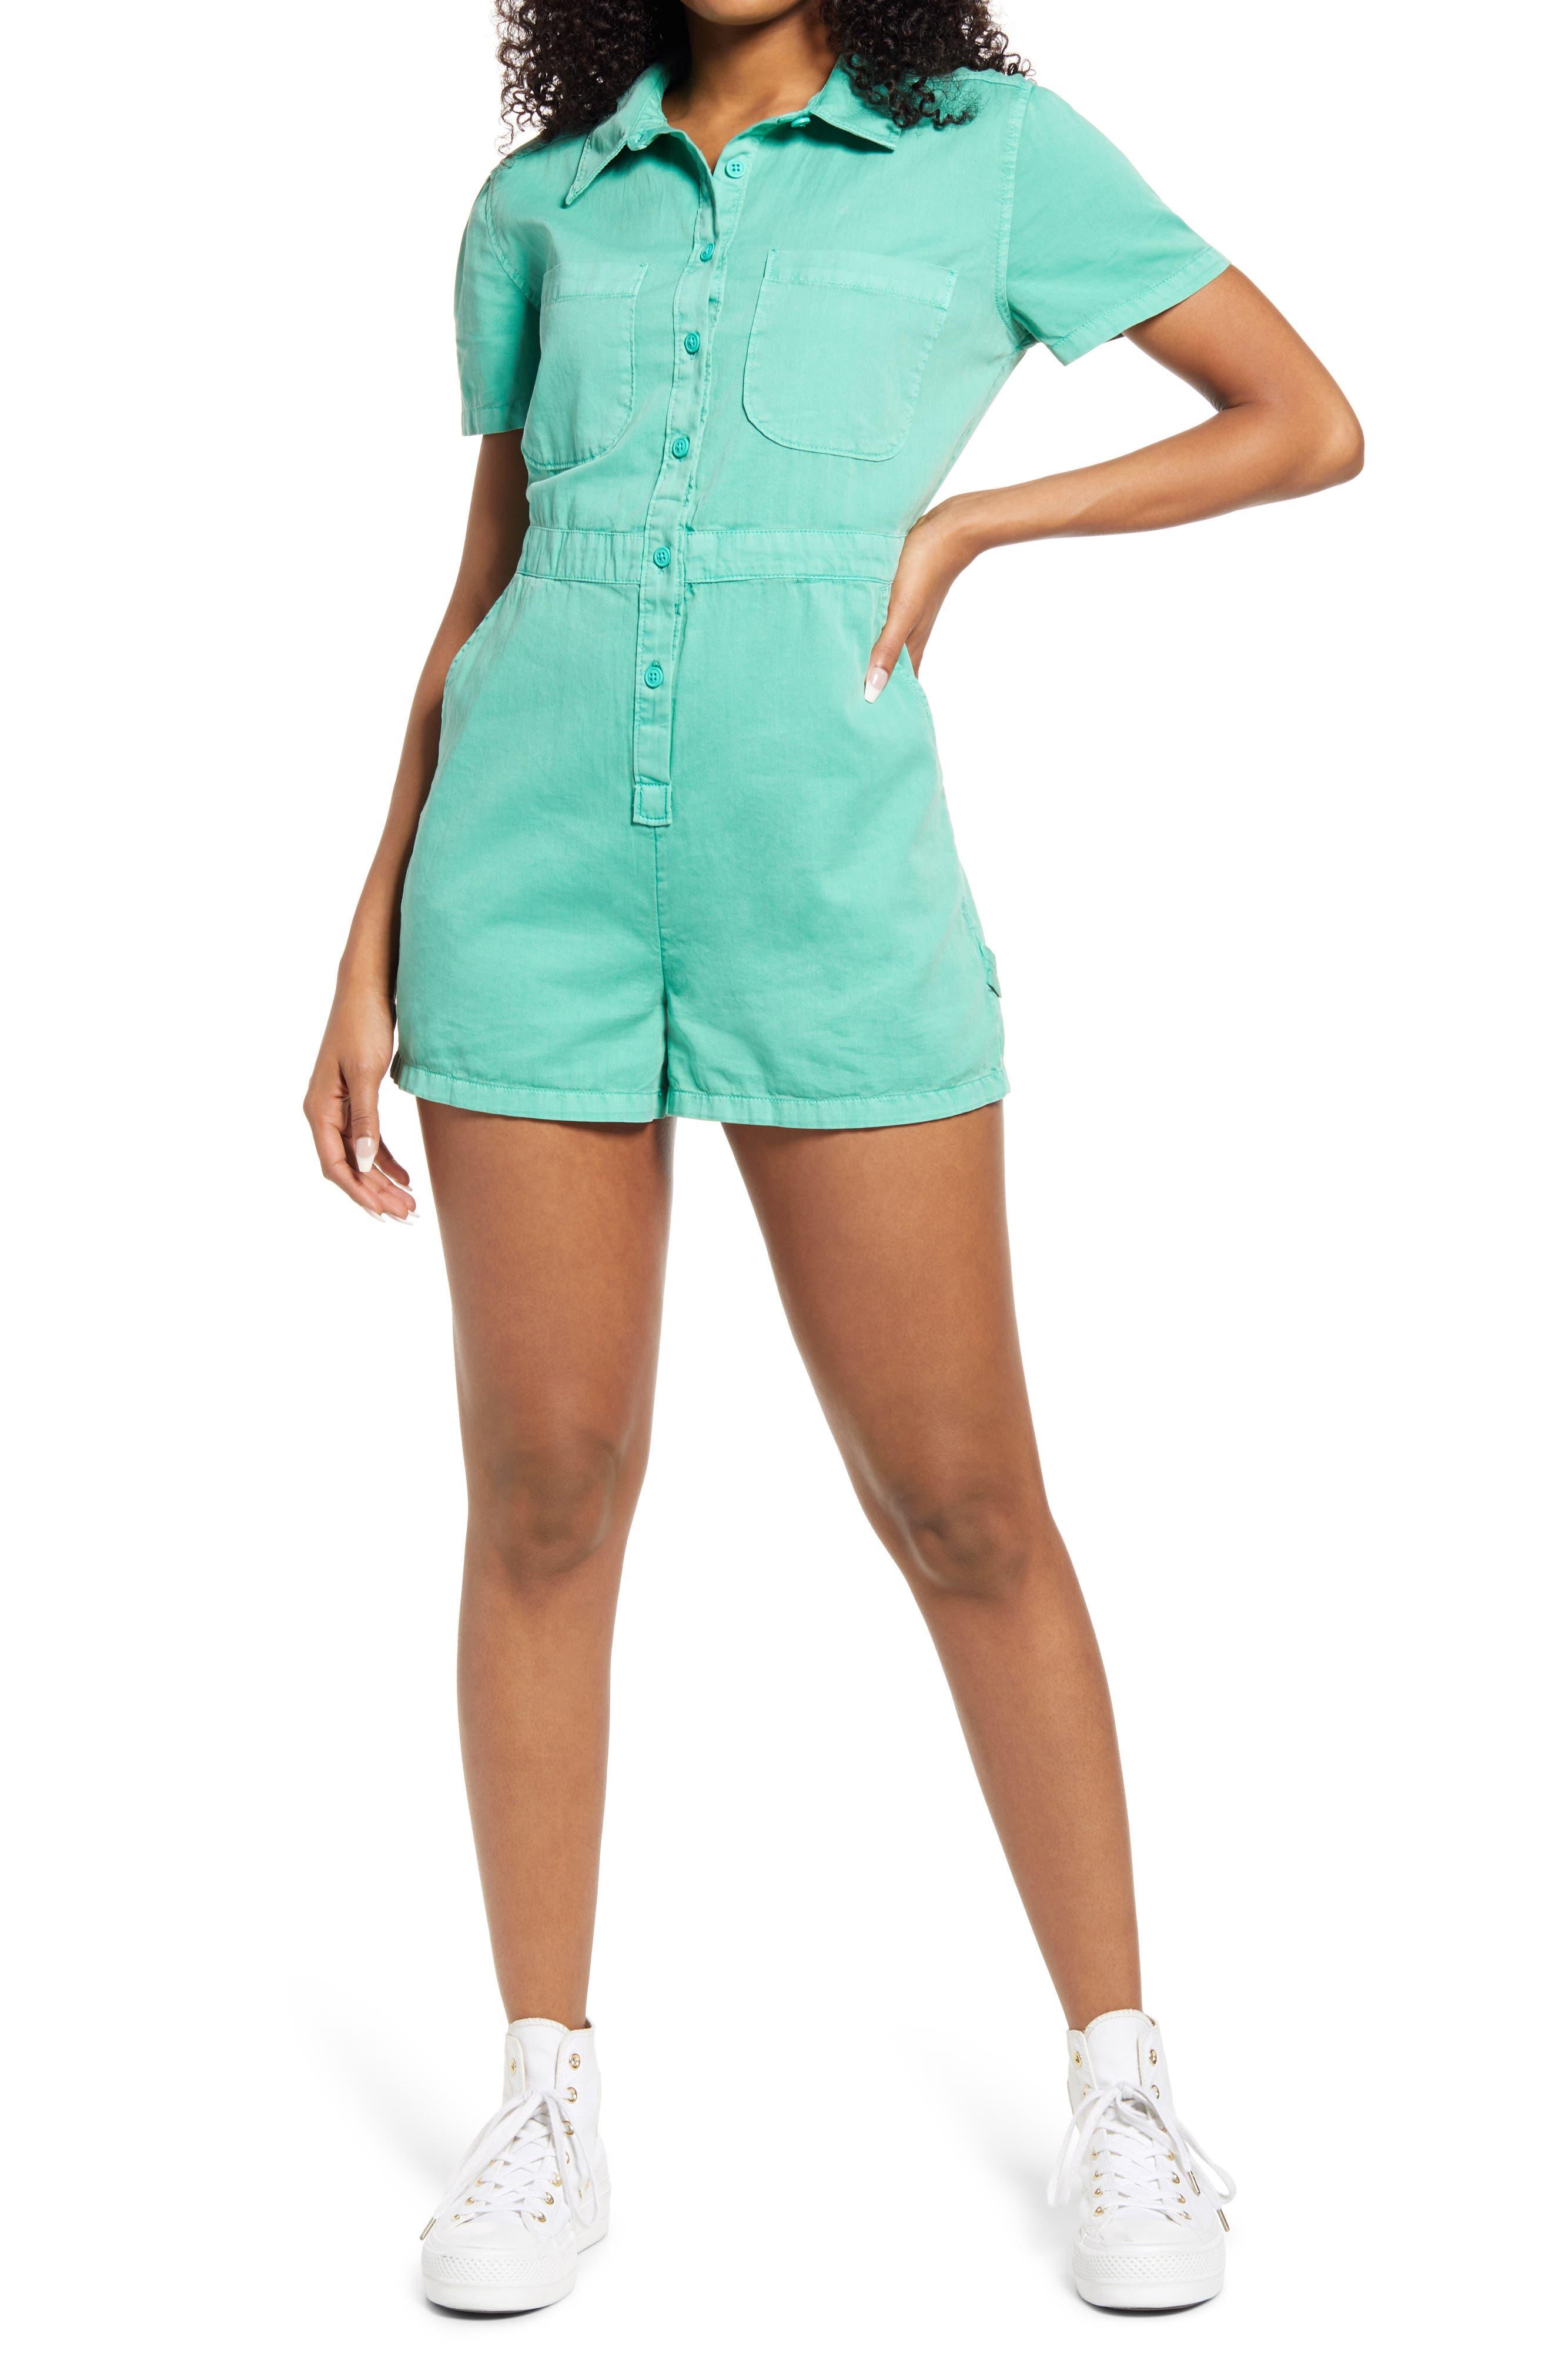 70s Shorts | Denim, High Rise, Athletic Womens Bp. Utility Button Front Romper Size Medium - Green $49.00 AT vintagedancer.com